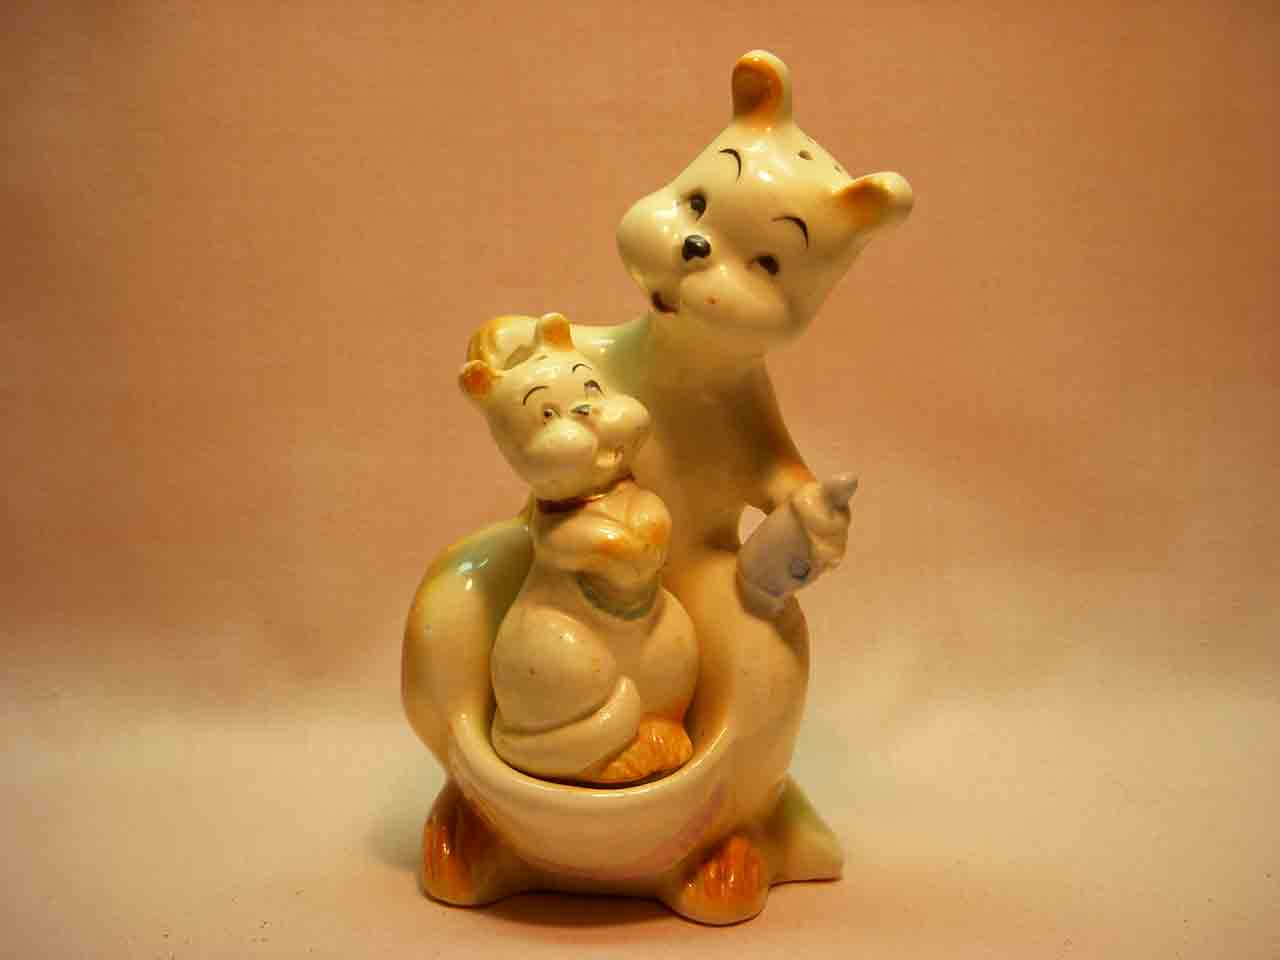 Nester baby joey kangaroo in mother's pouch salt and pepper shaker